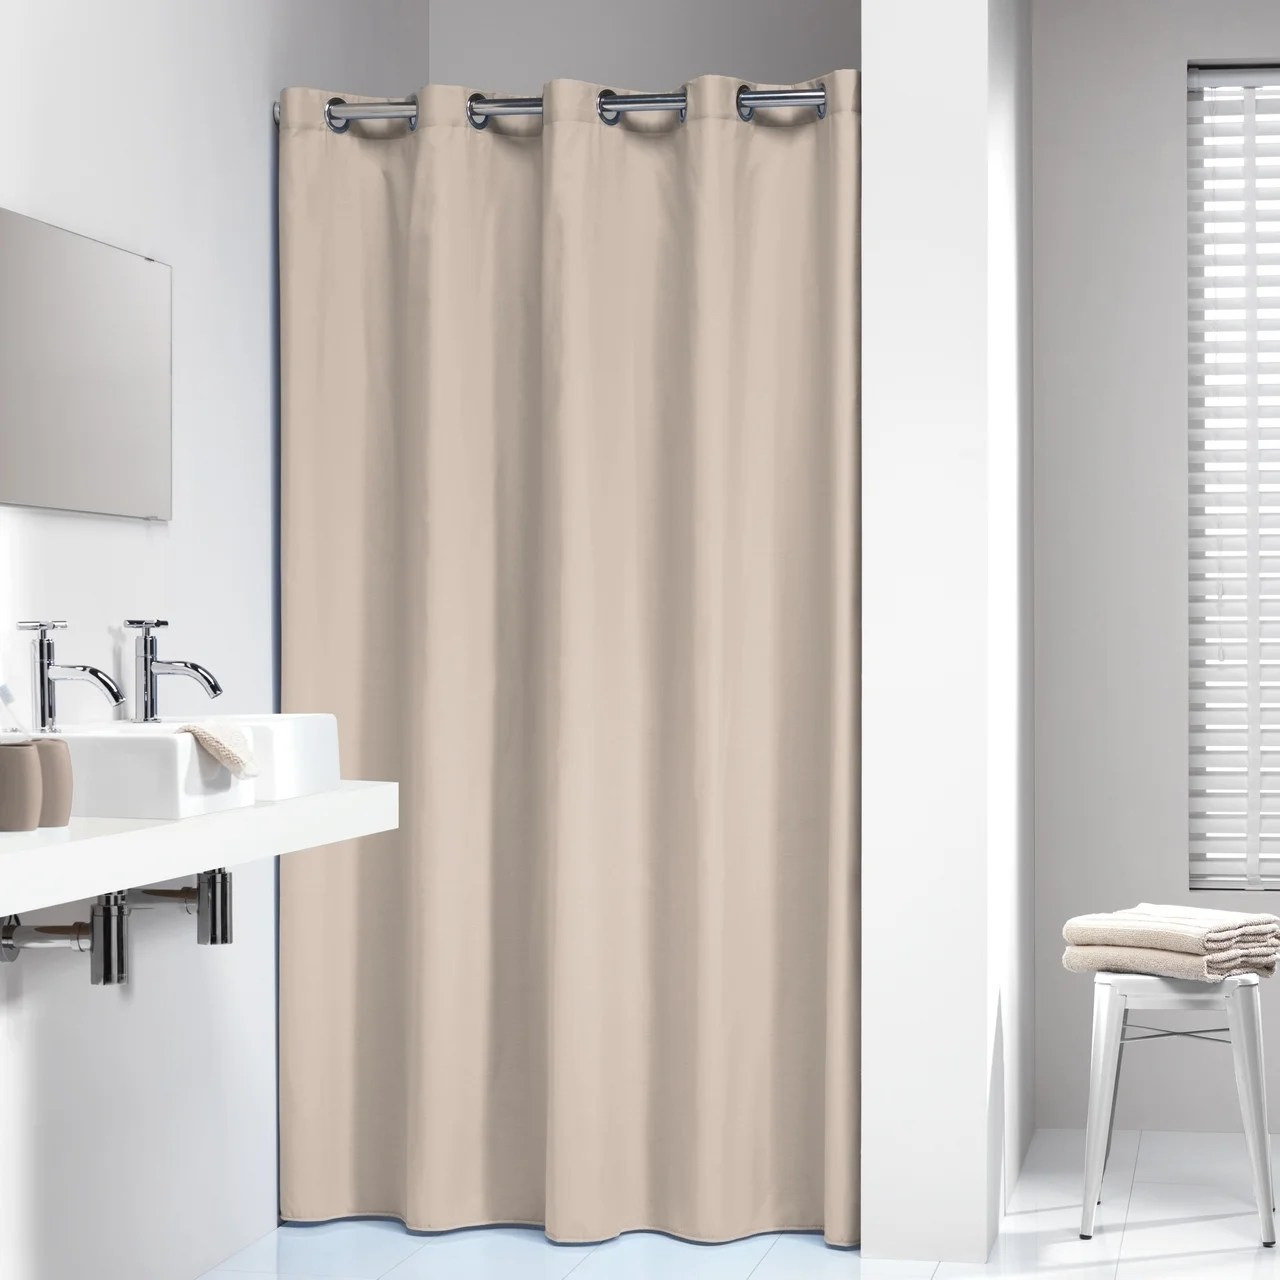 sealskin extra long hookless shower curtain 78 x 72 inch coloris beige cotton